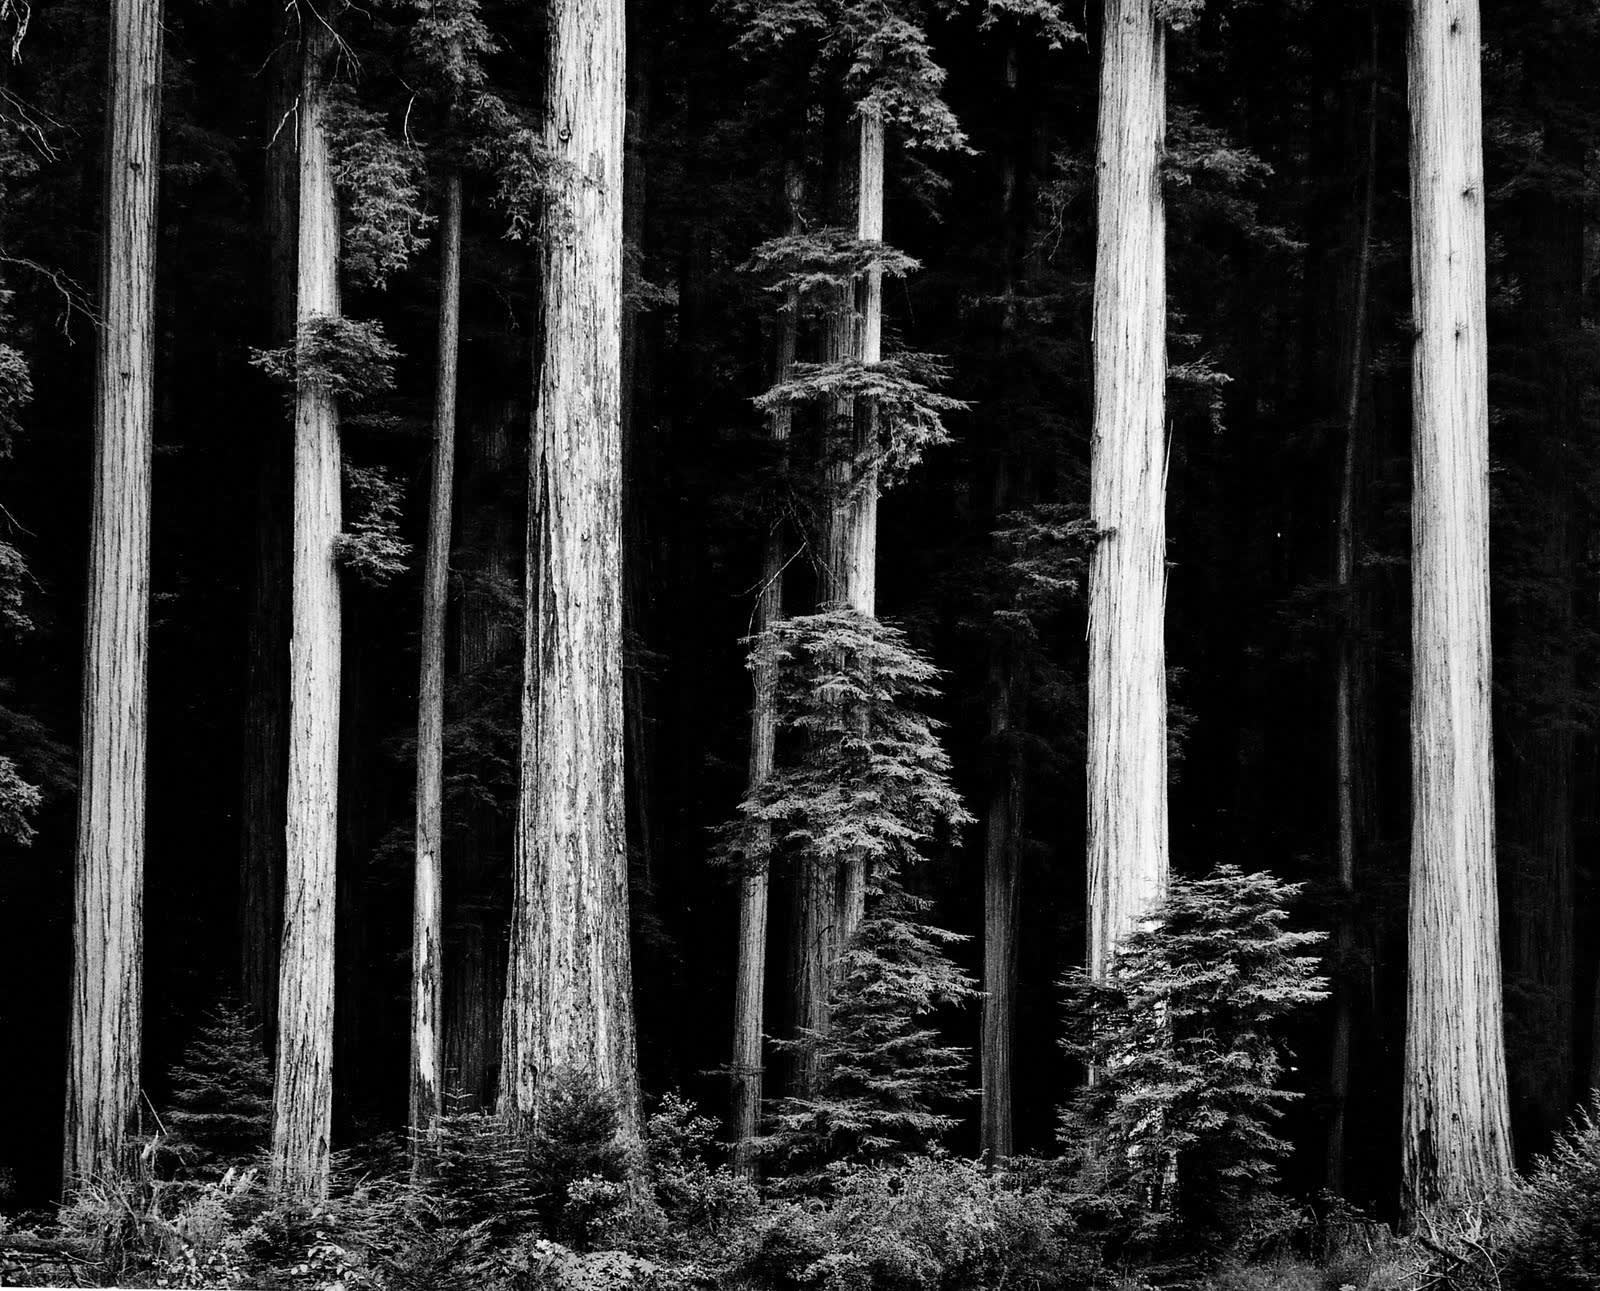 Ansel Adams, Redwoods, Bull Creek Flat, Northern California, 1960 (Printed 1970's)